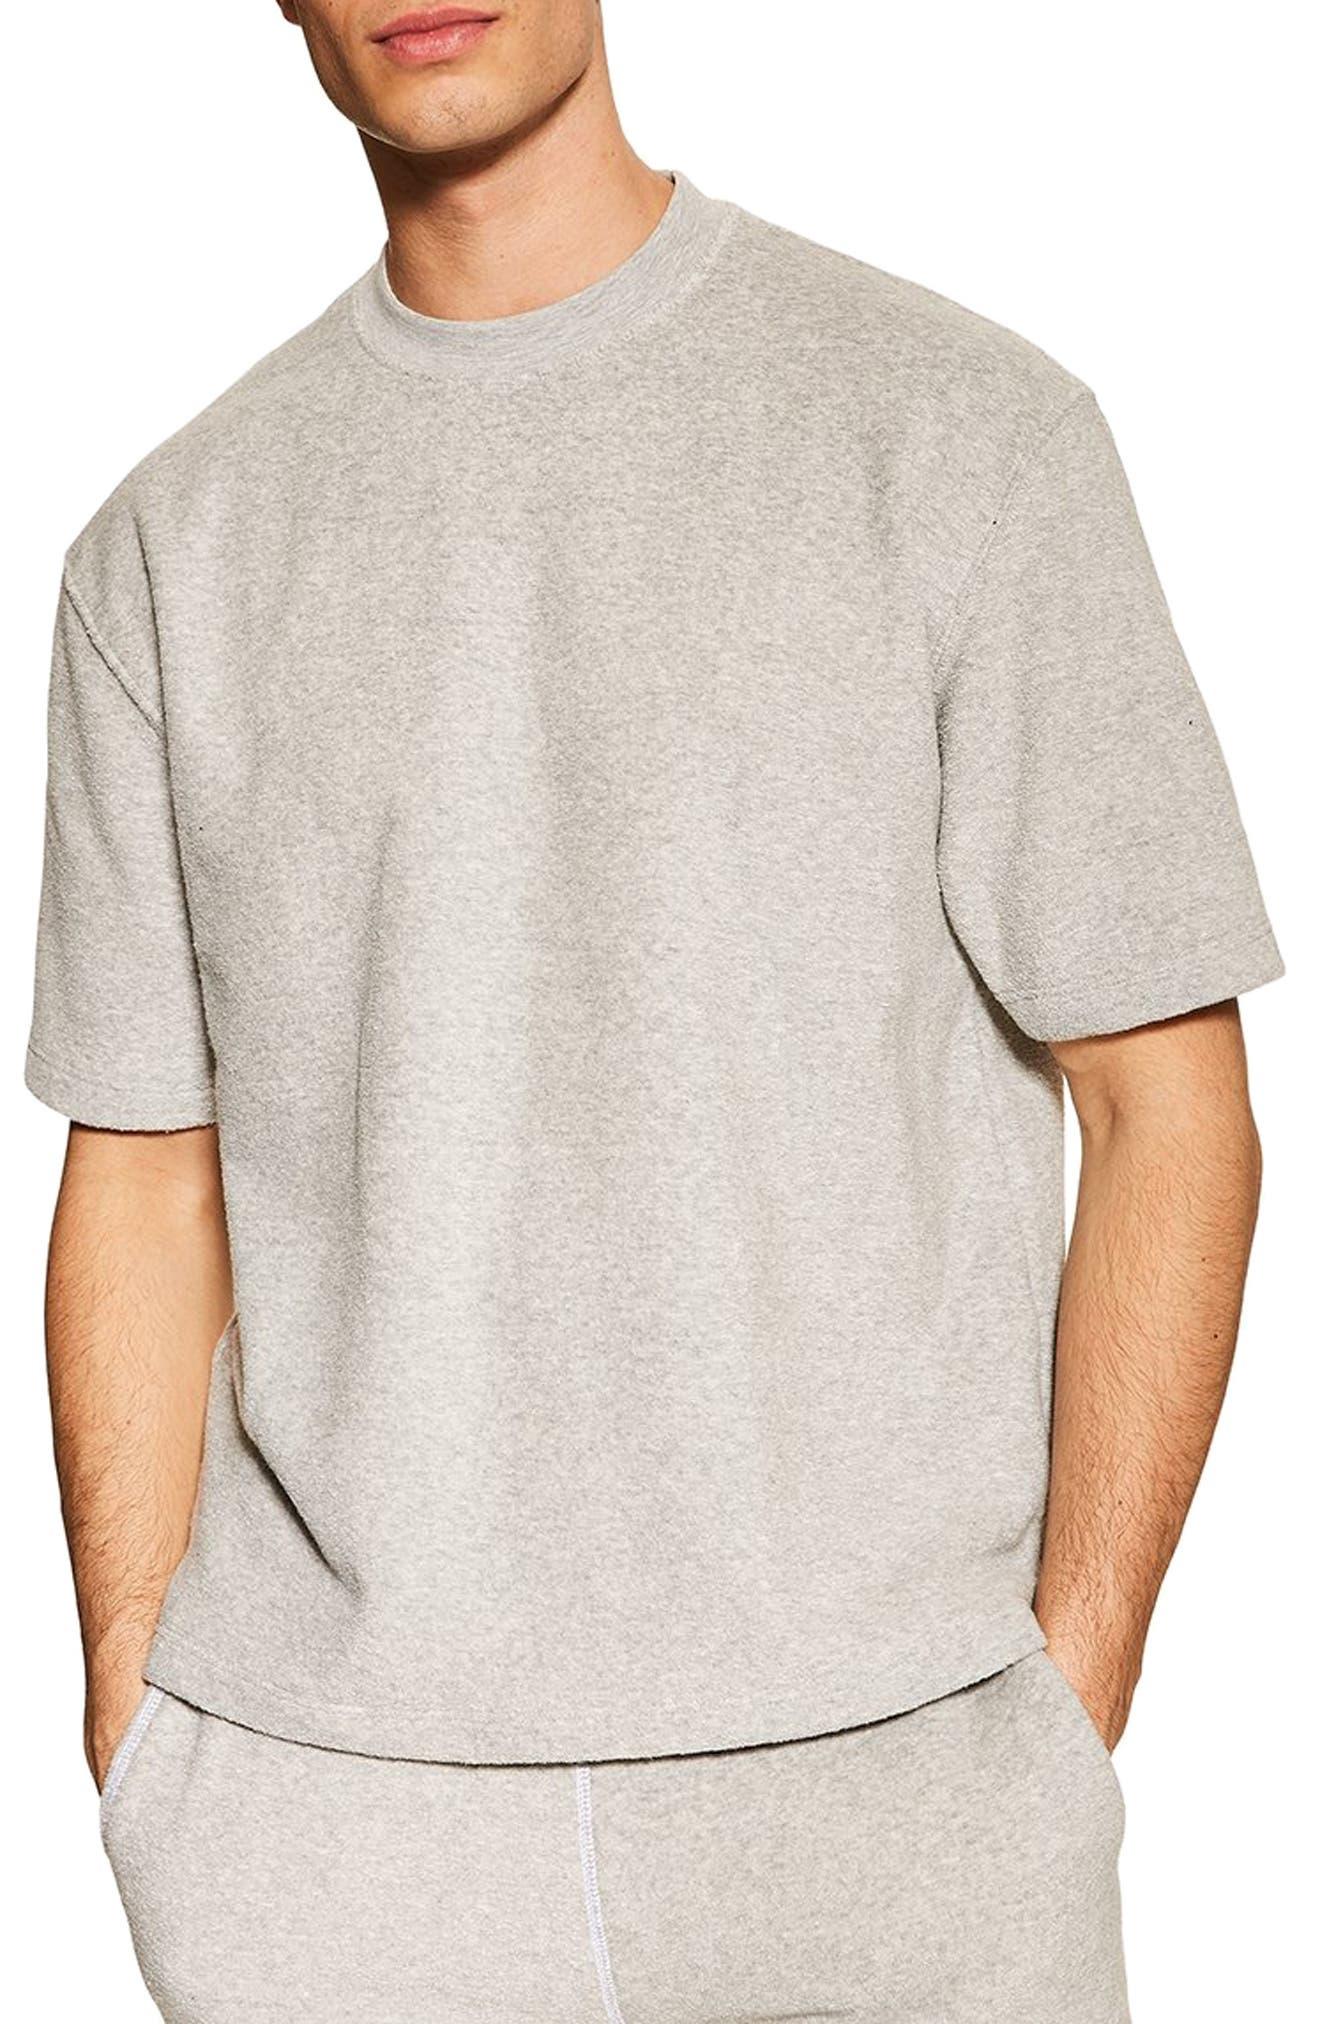 TOPMAN, Short Sleeve Terry Sweatshirt, Main thumbnail 1, color, GREY